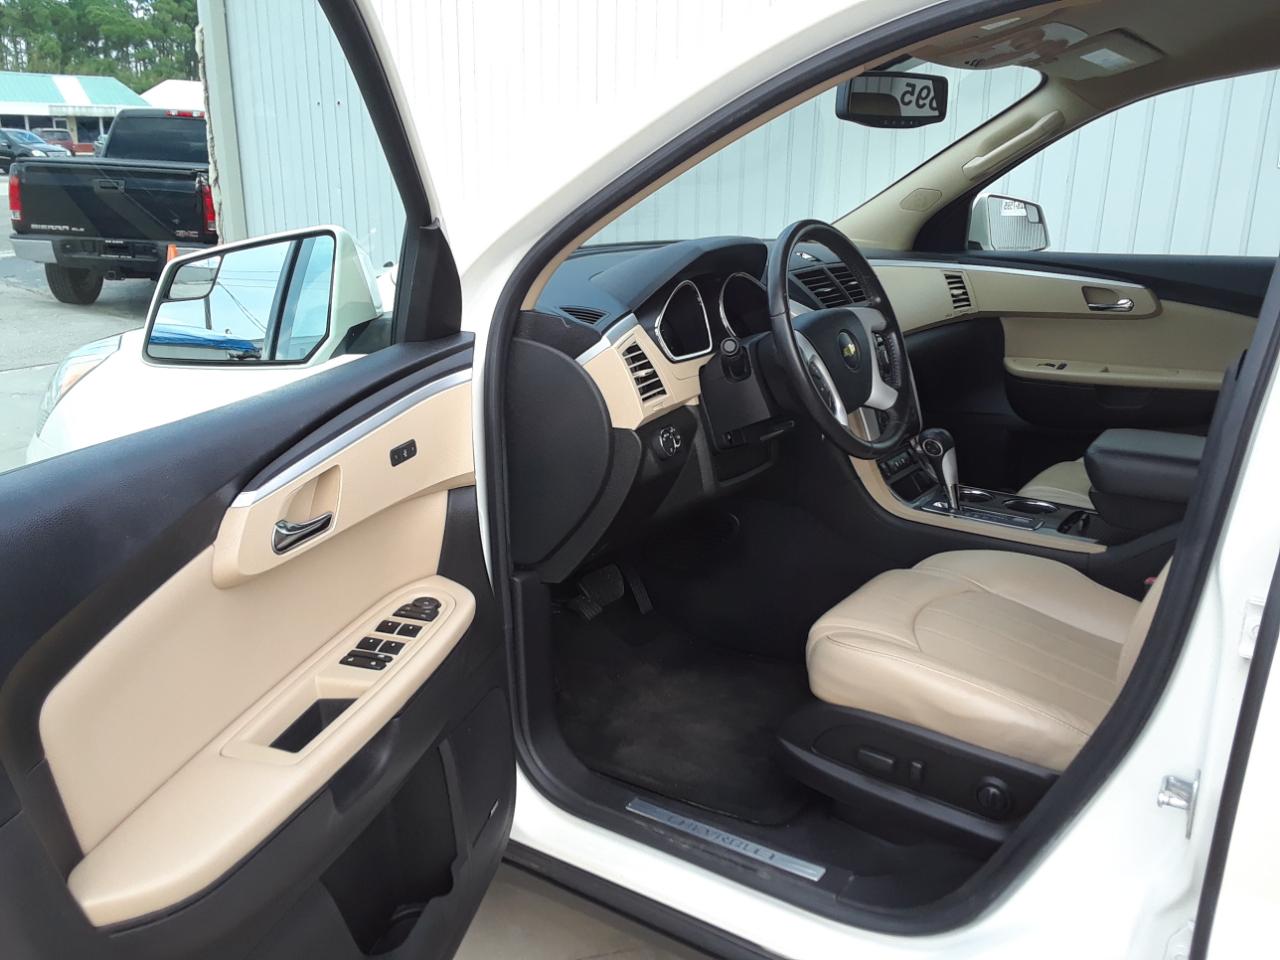 2011 Chevrolet Traverse FWD 4dr LTZ